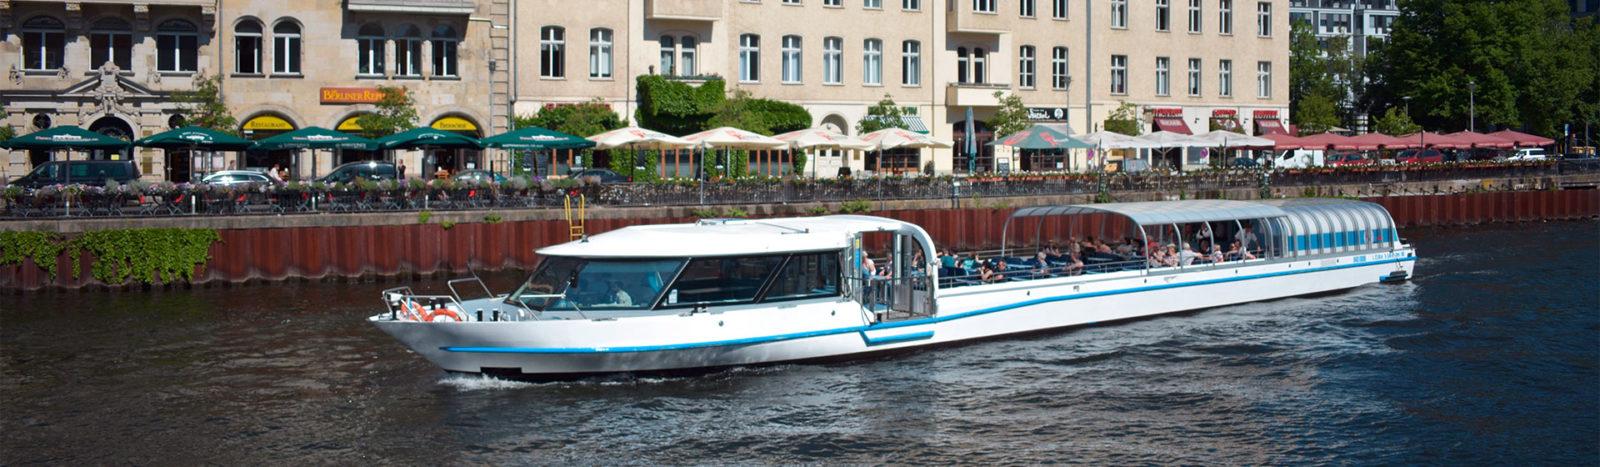 Schifffahrt-Berlin